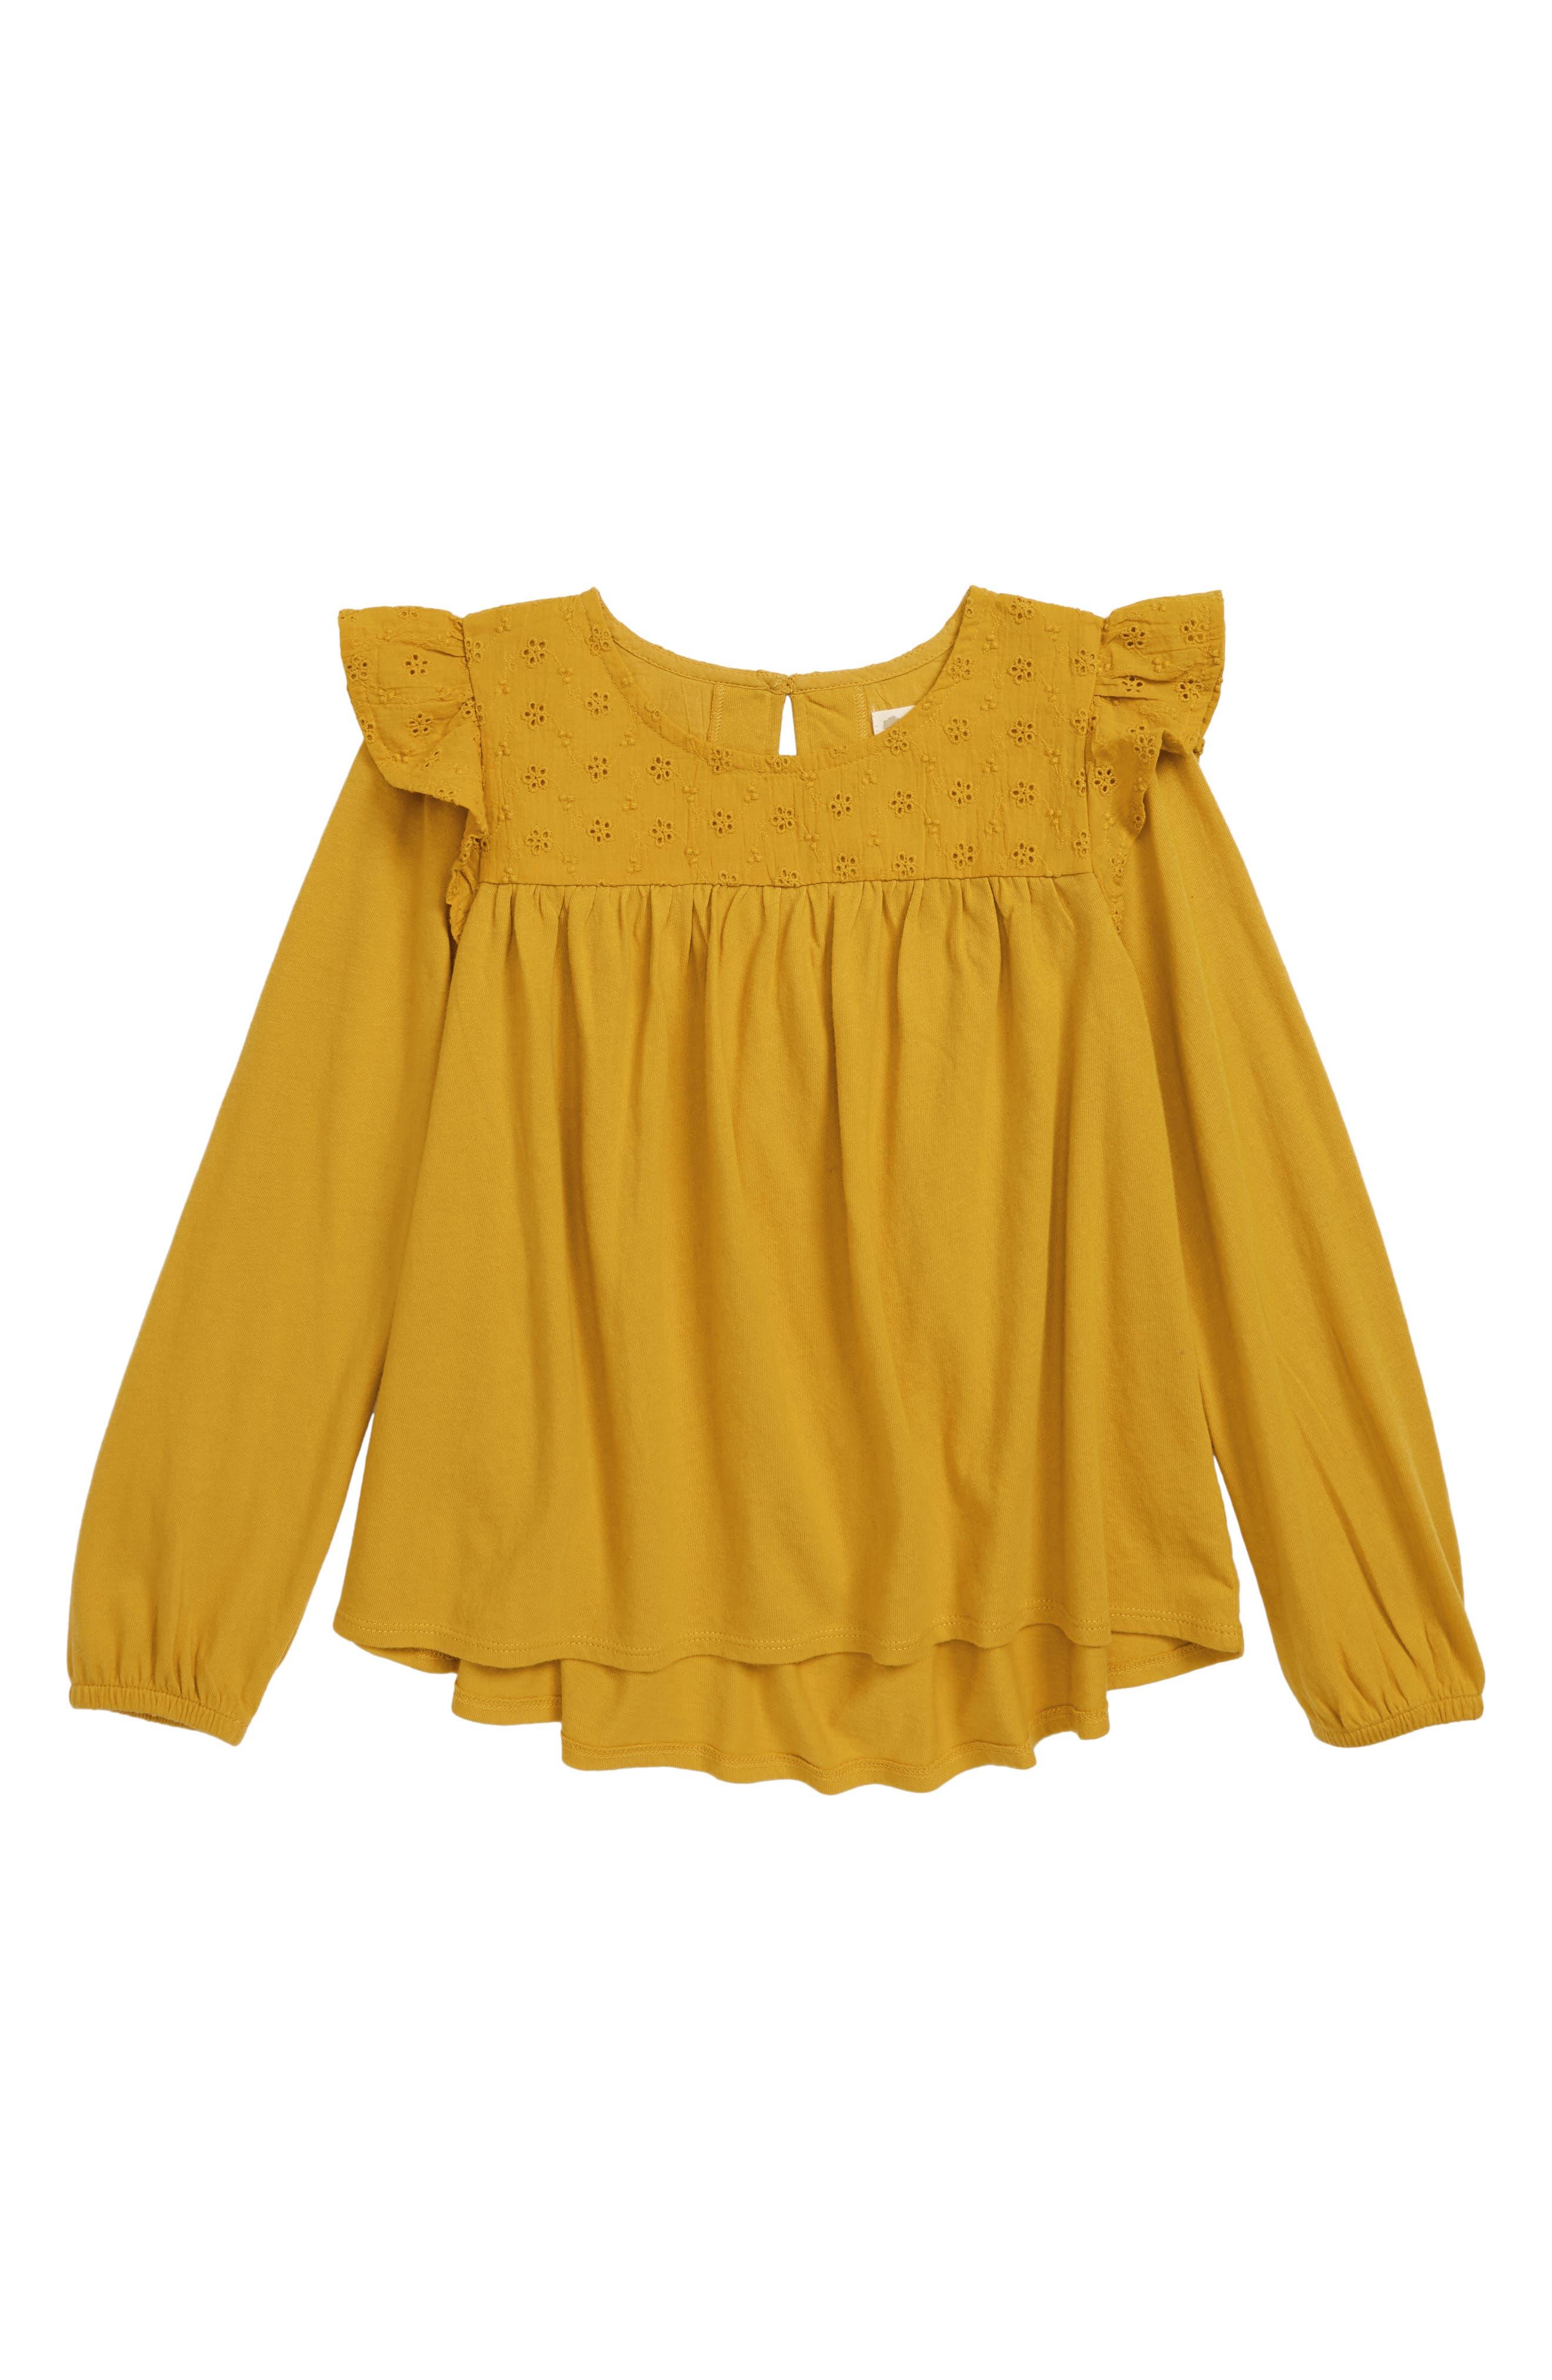 Girls Tucker  Tate Eyelet Flutter Sleeve Swing Top Size 8  Yellow